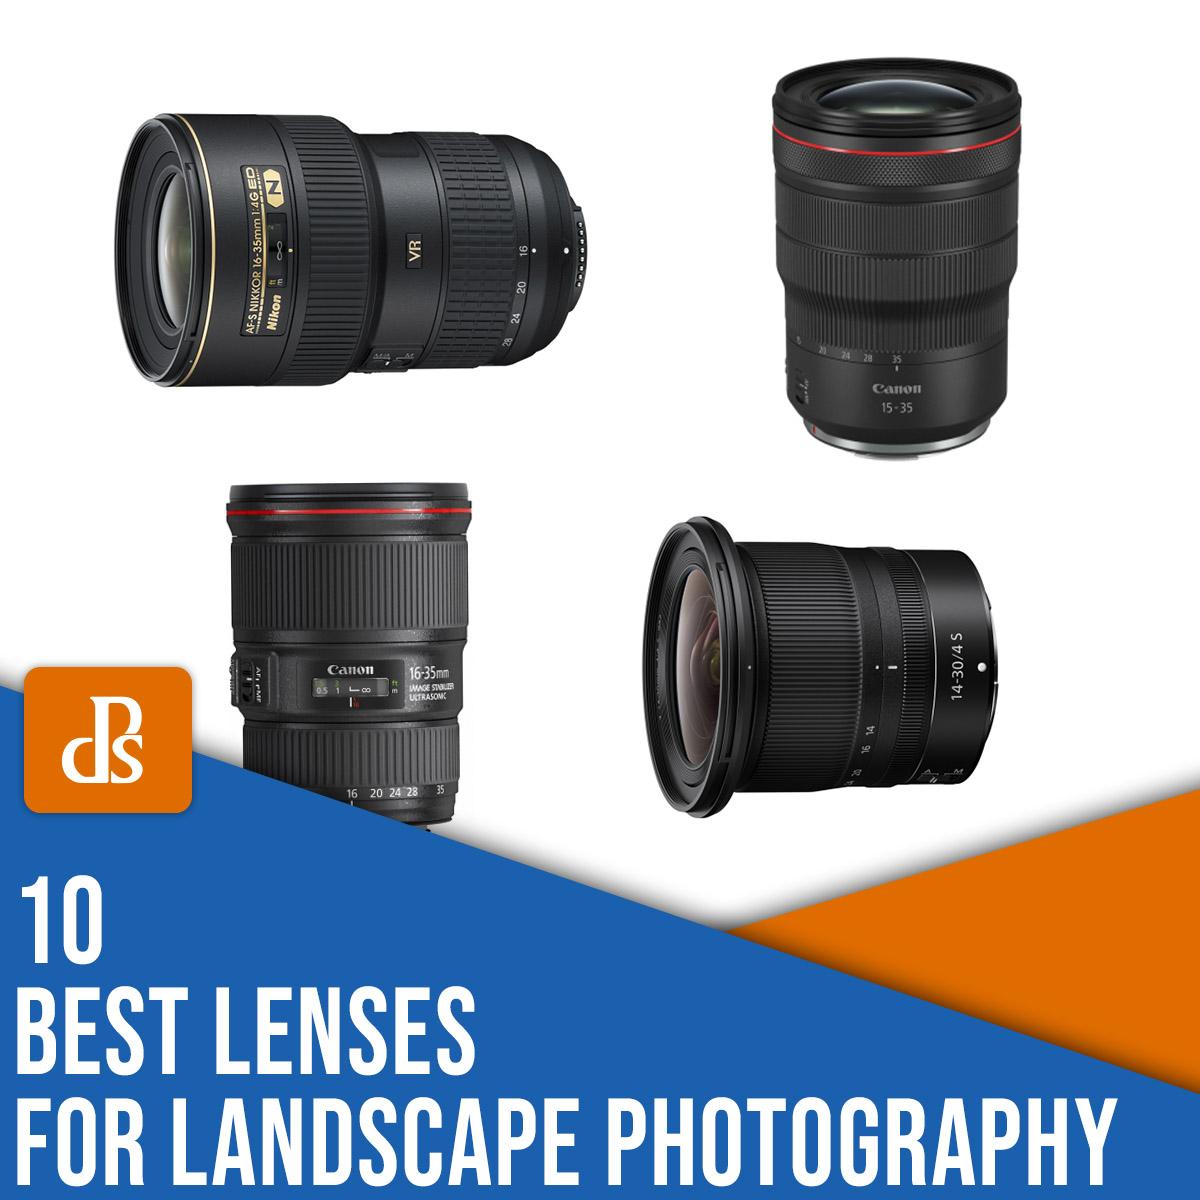 the 10 best lenses for landscape photography